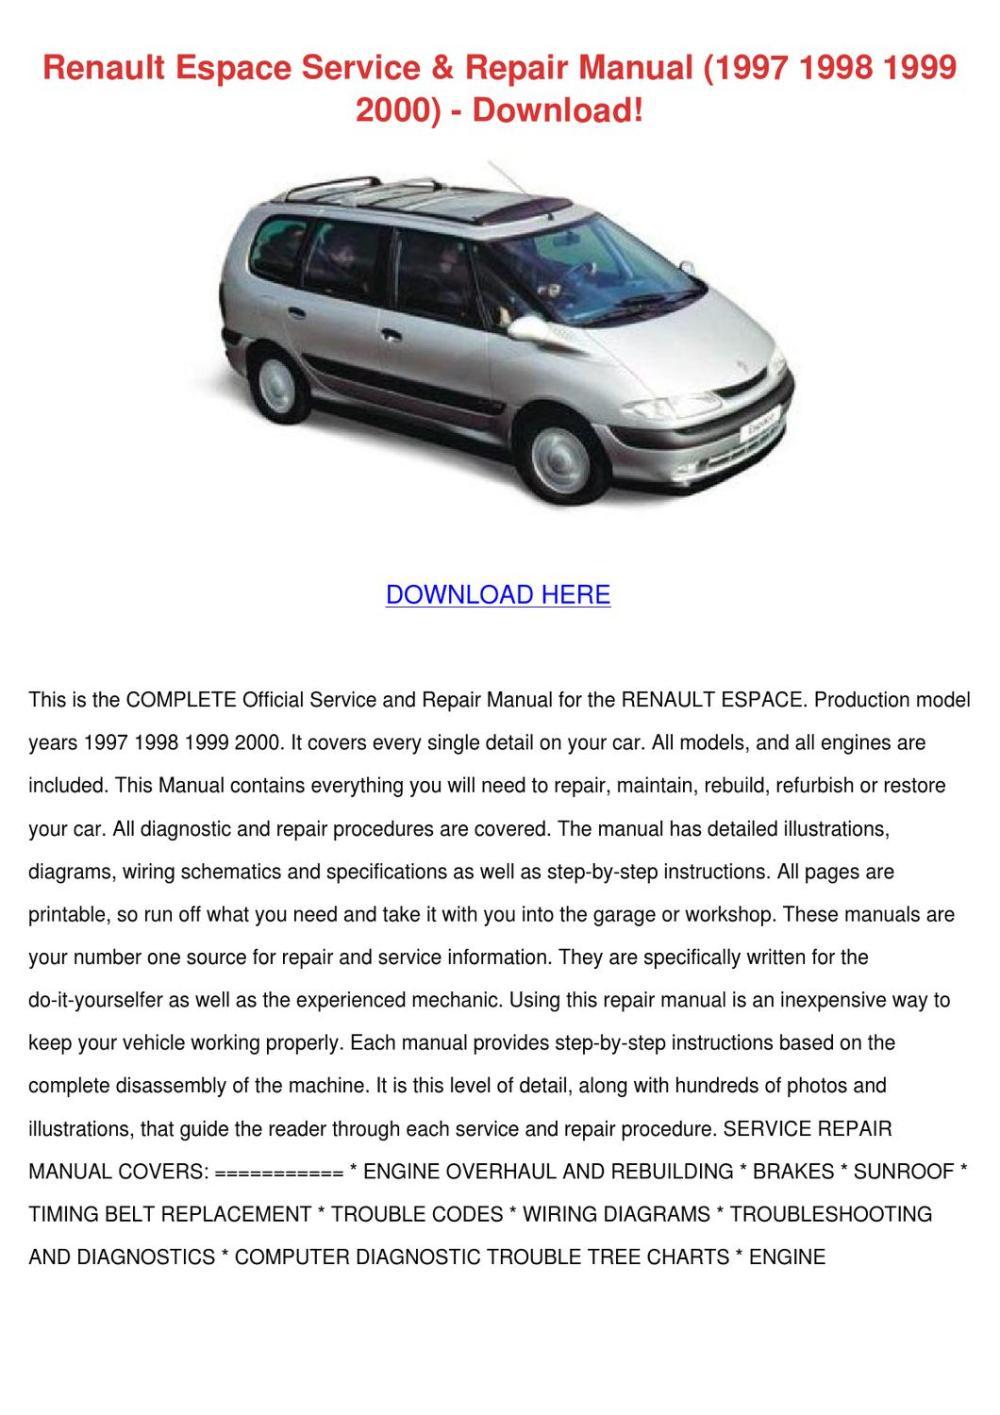 medium resolution of renault espace service repair manual 1997 199